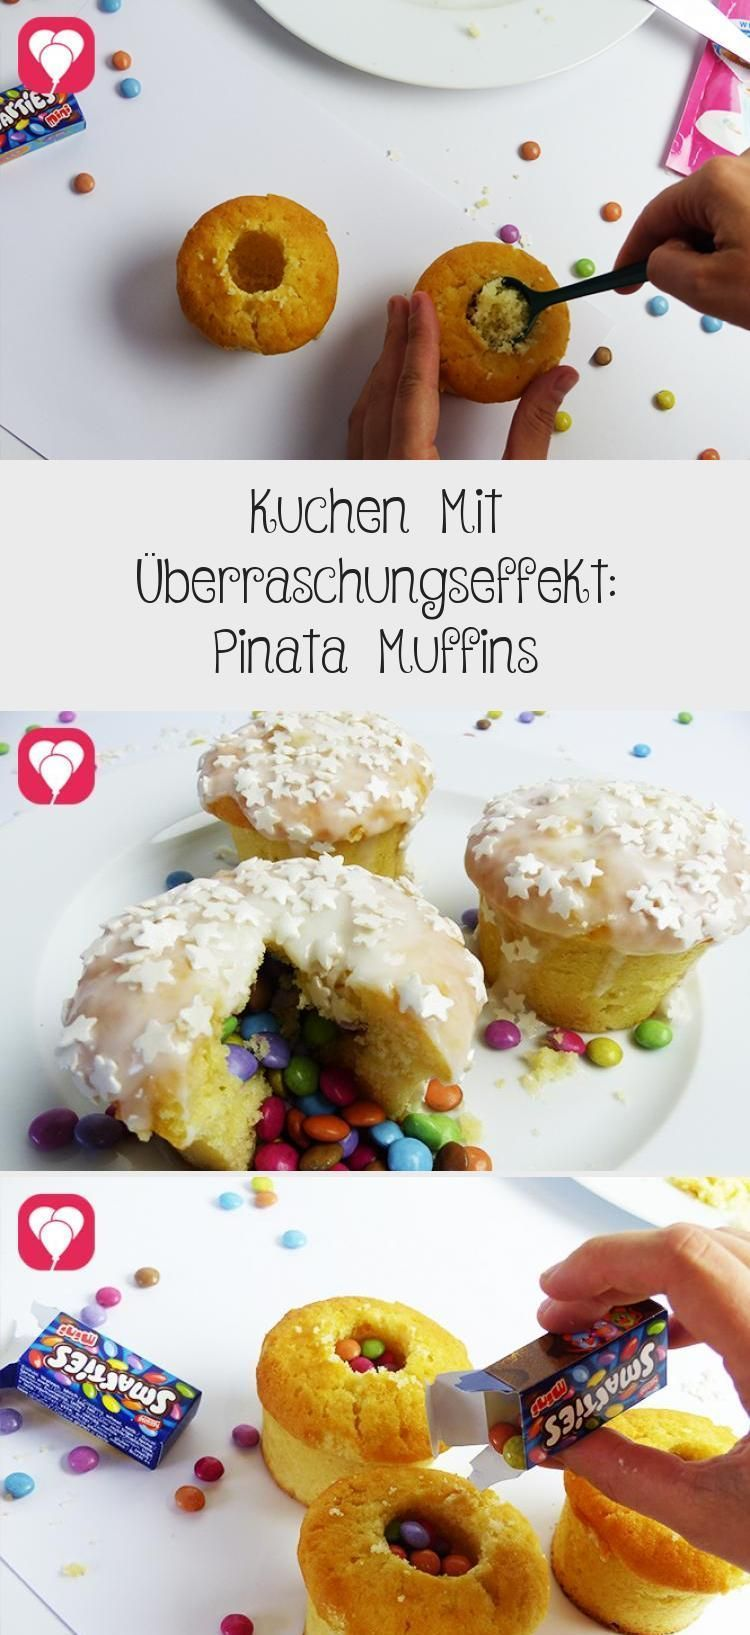 Photo of Kuchen mit Überraschungseffekt: Pinata Muffins – Ballon #PinataKuchenRegenbo …..